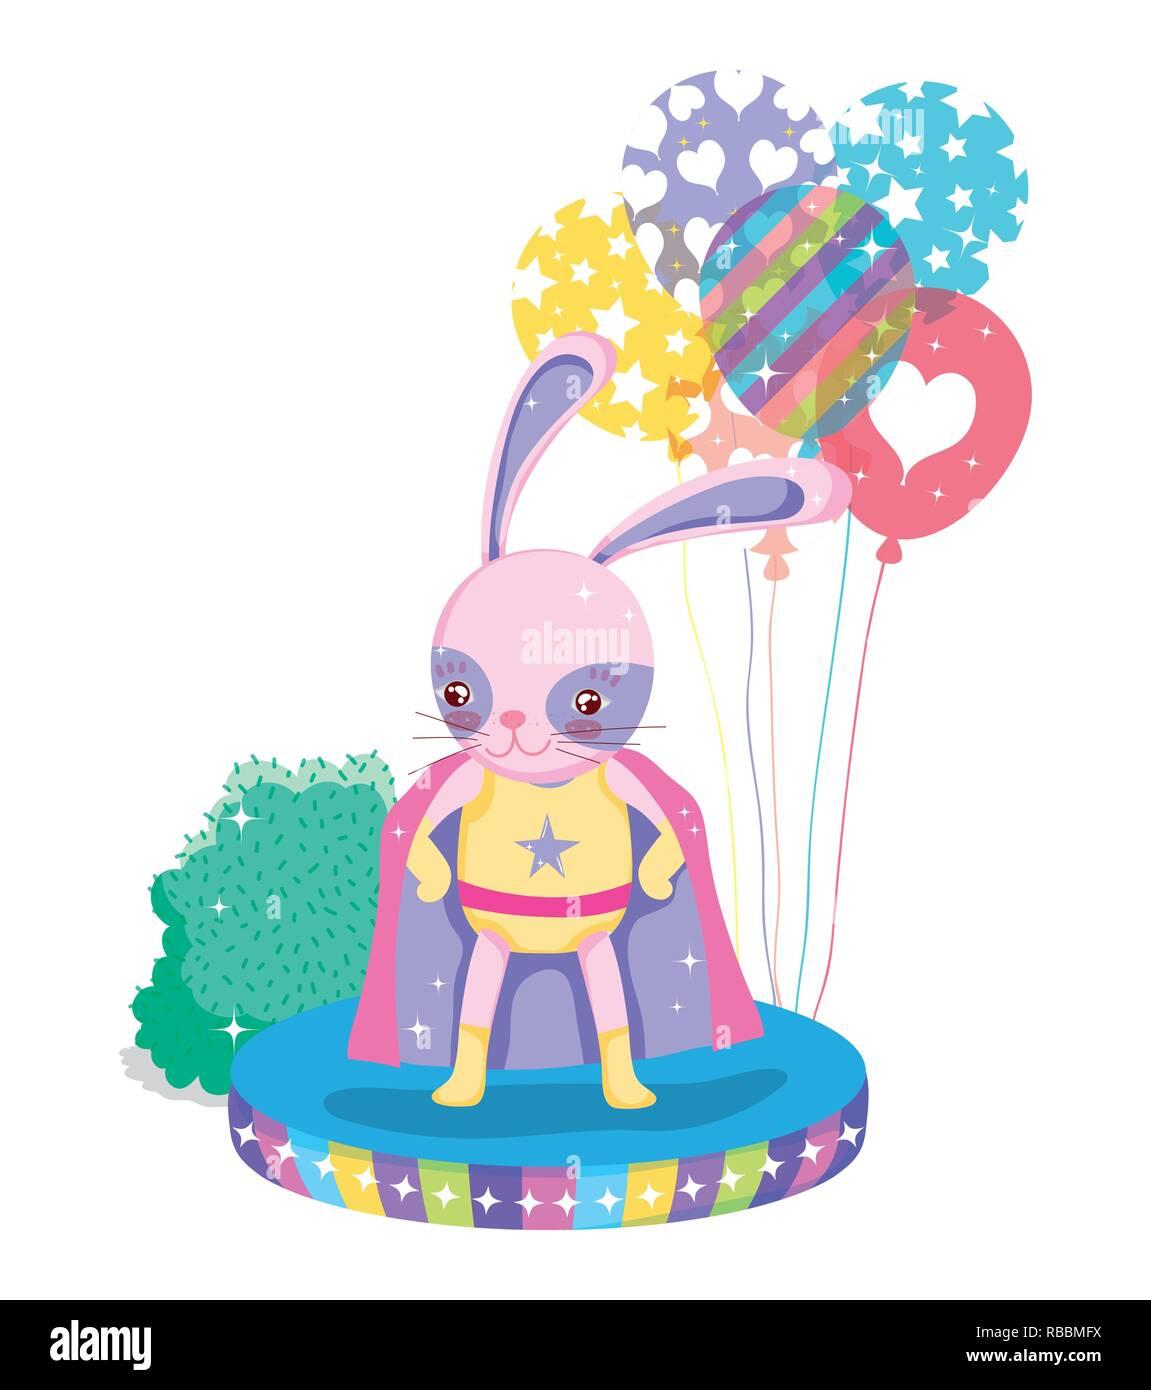 rabbit hero costume with balloons to circus show - Stock Image